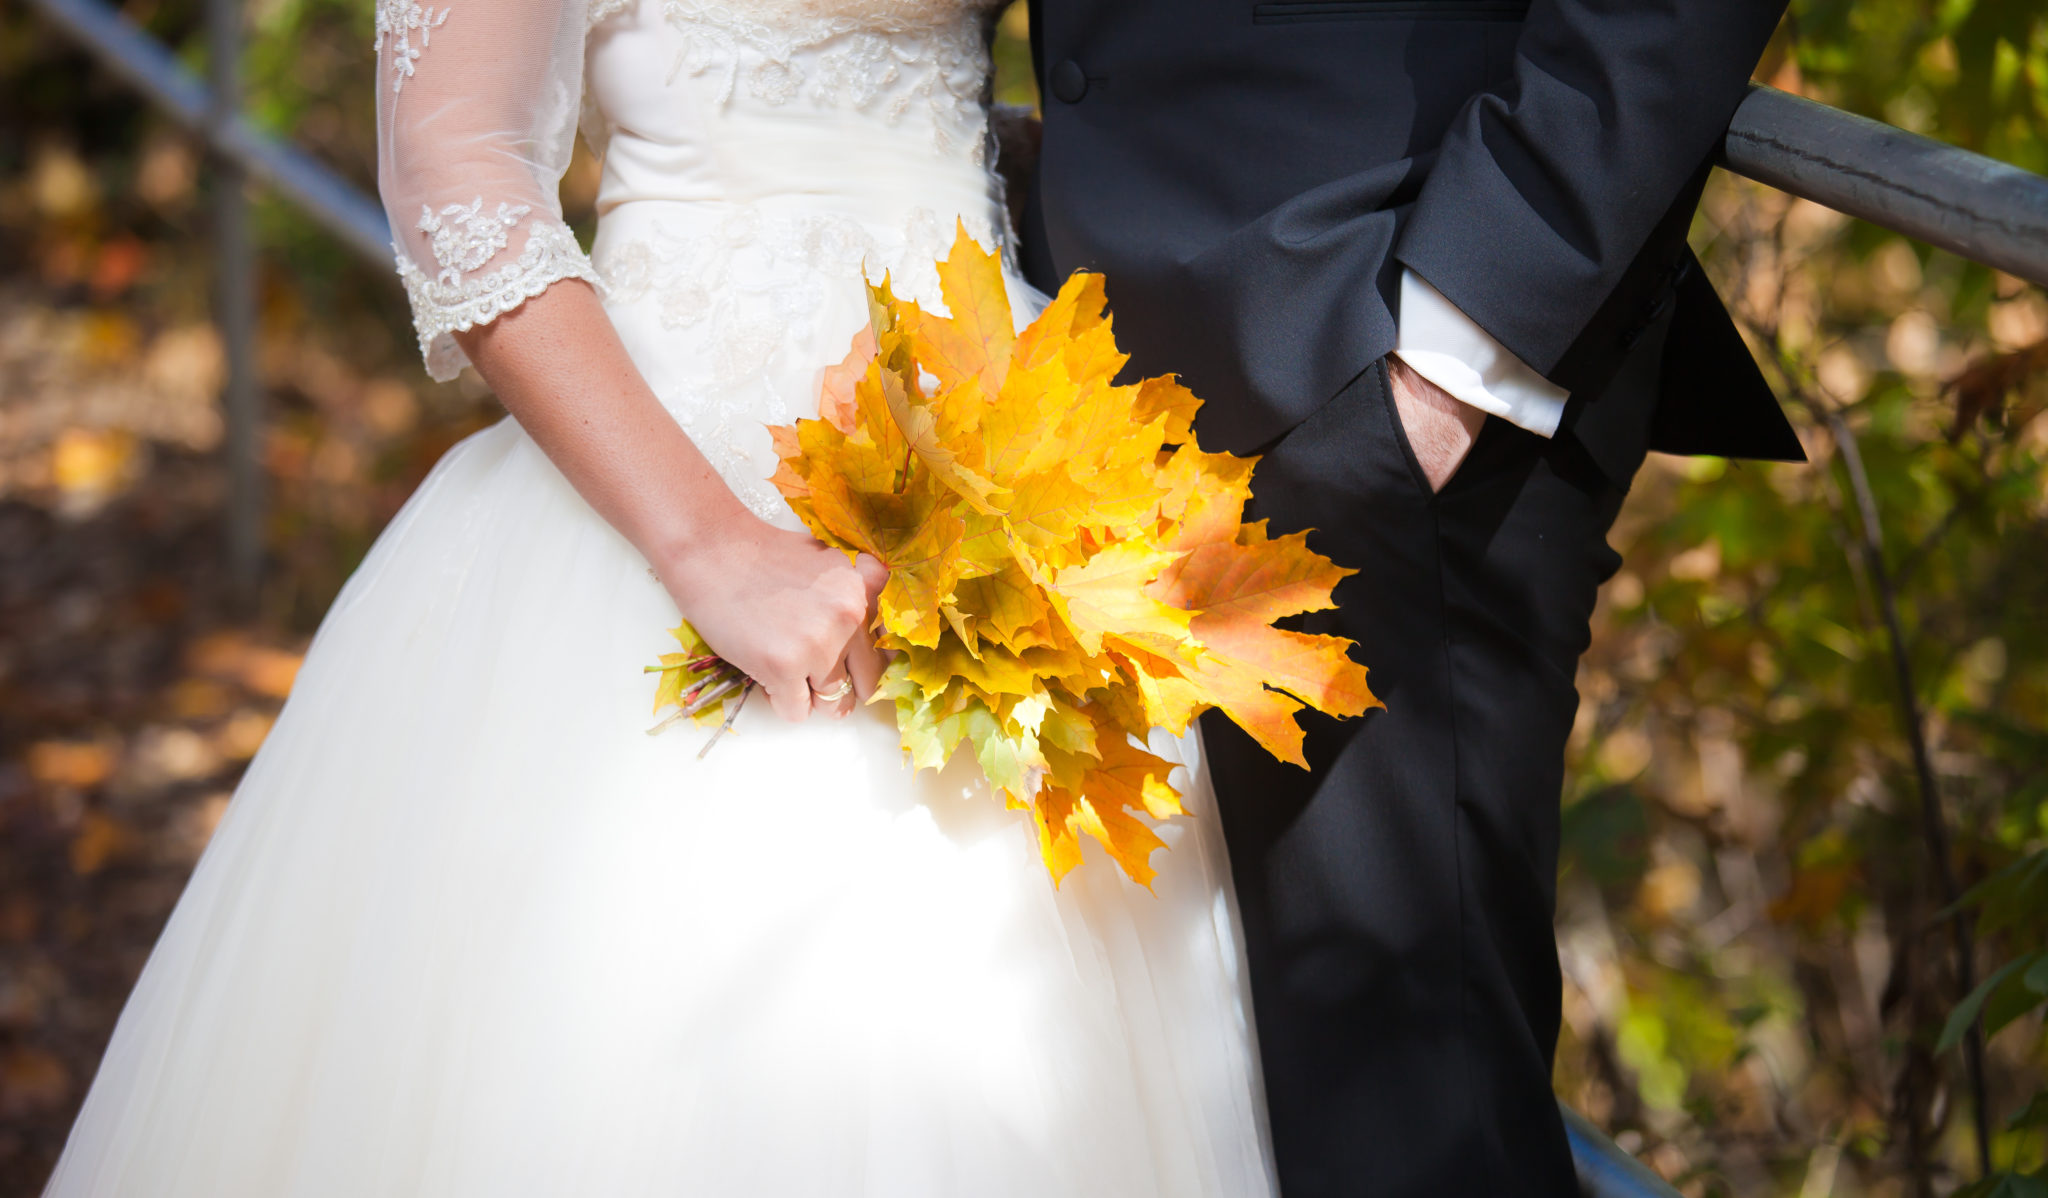 Matrimonio a tema autunno